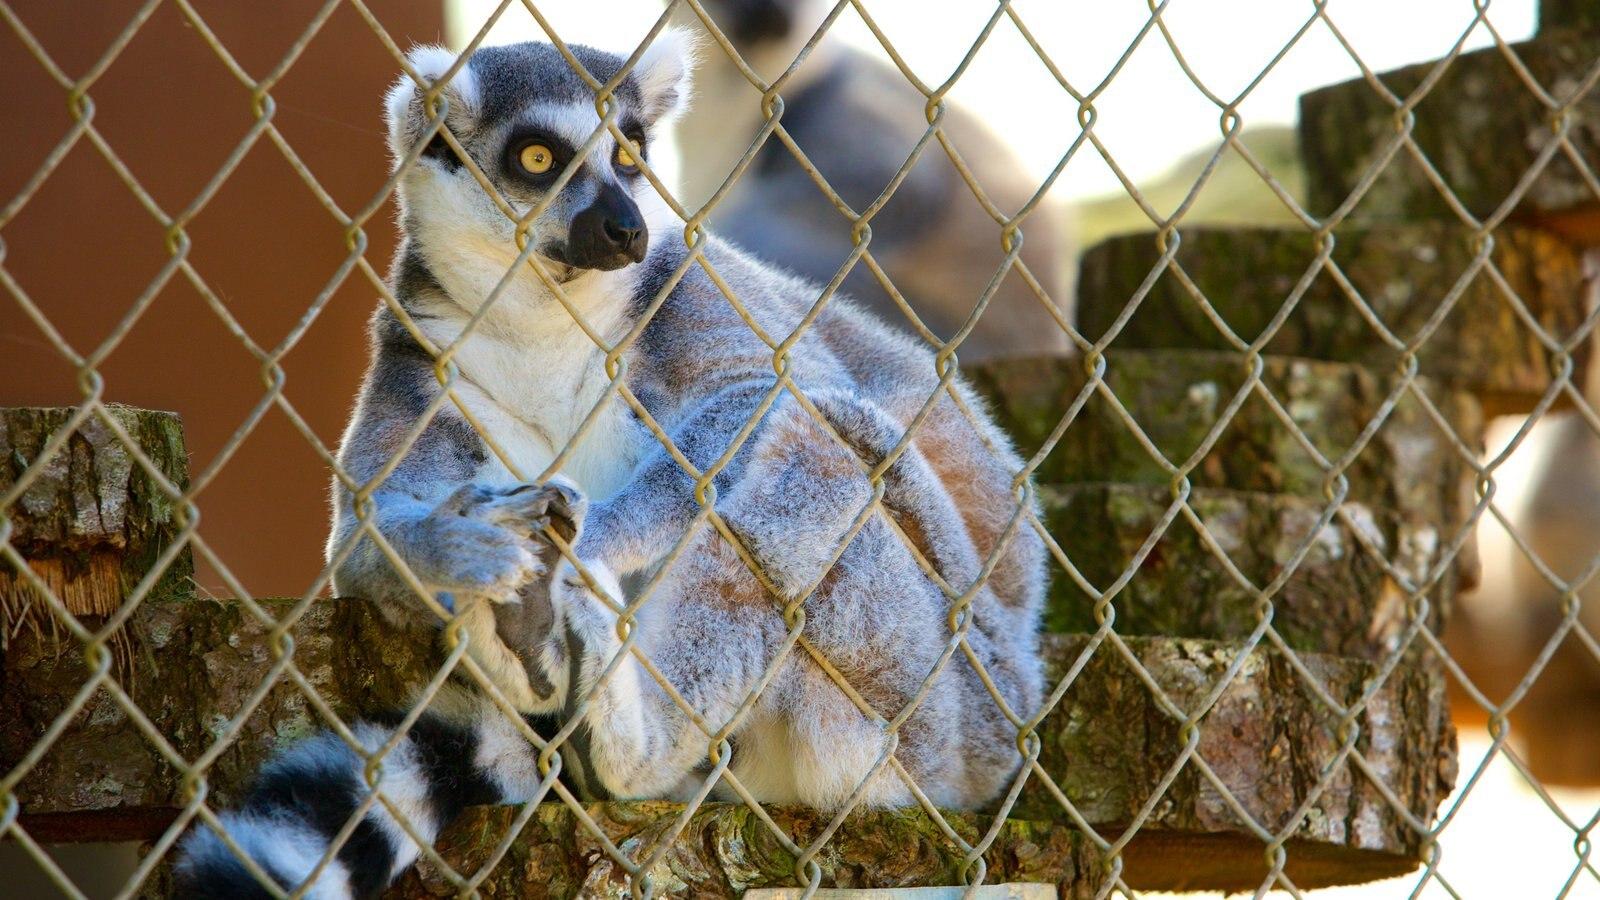 West Coast Game Park Safari caracterizando animais de zoológico e animais fofos ou amigáveis